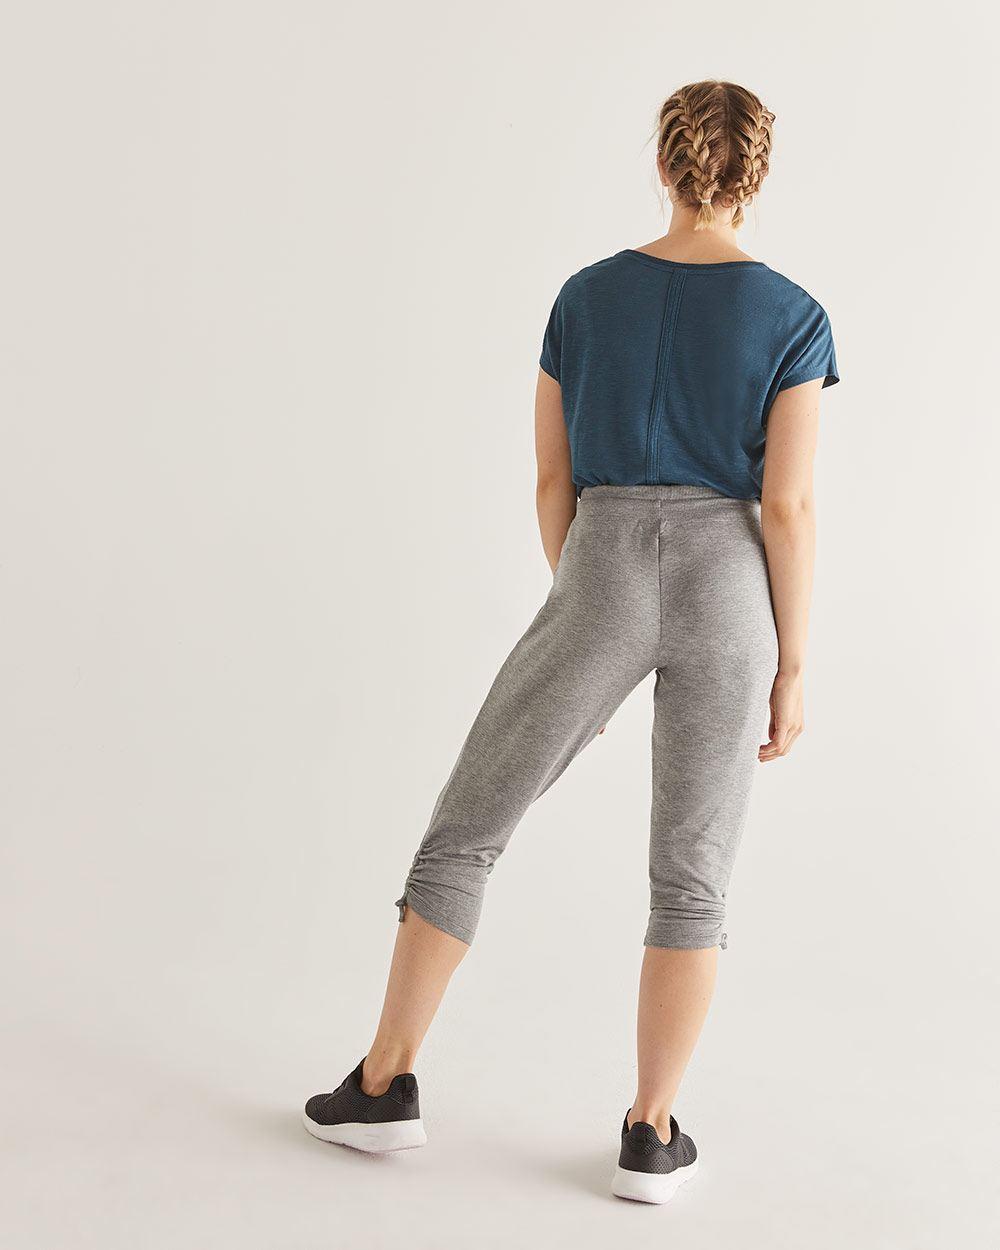 6a570c987ff Hyba Heather Grey Cropped Jogger | Regular | Reitmans